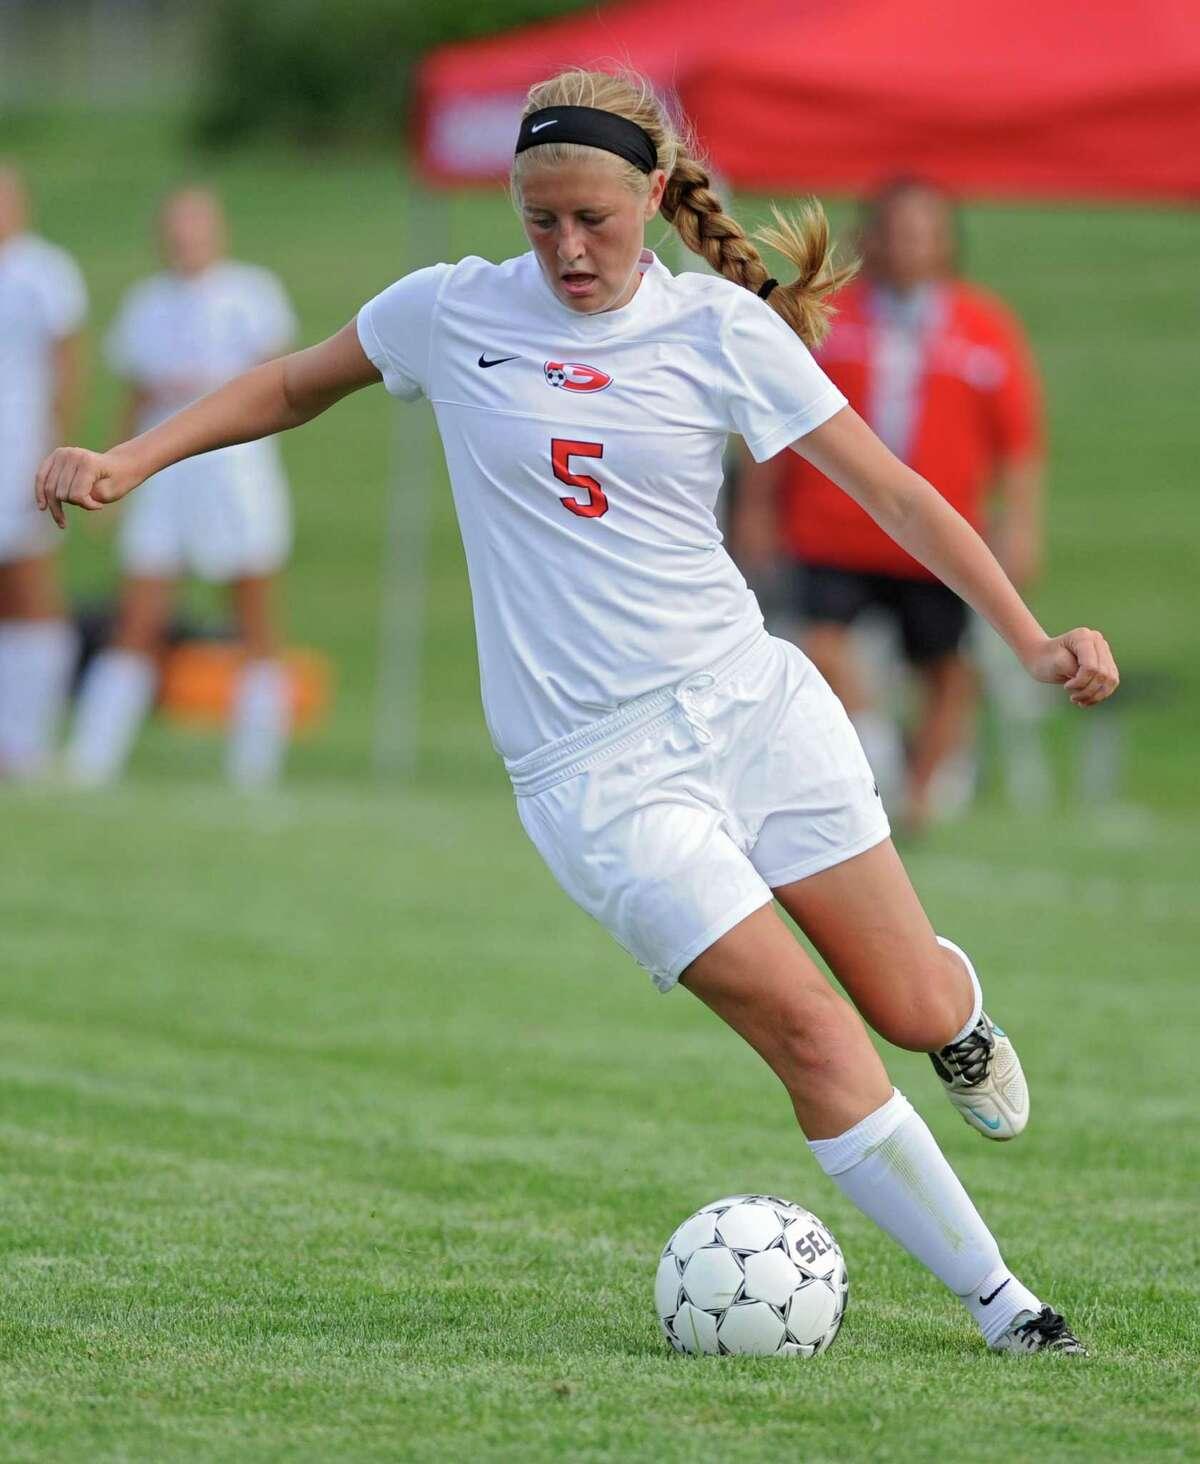 Guilderland's Katie Becker kicks the ball during a soccer game against Bethlehem on Tuesday, Sept. 3, 2013 in Guilderland, N.Y. (Lori Van Buren / Times Union)